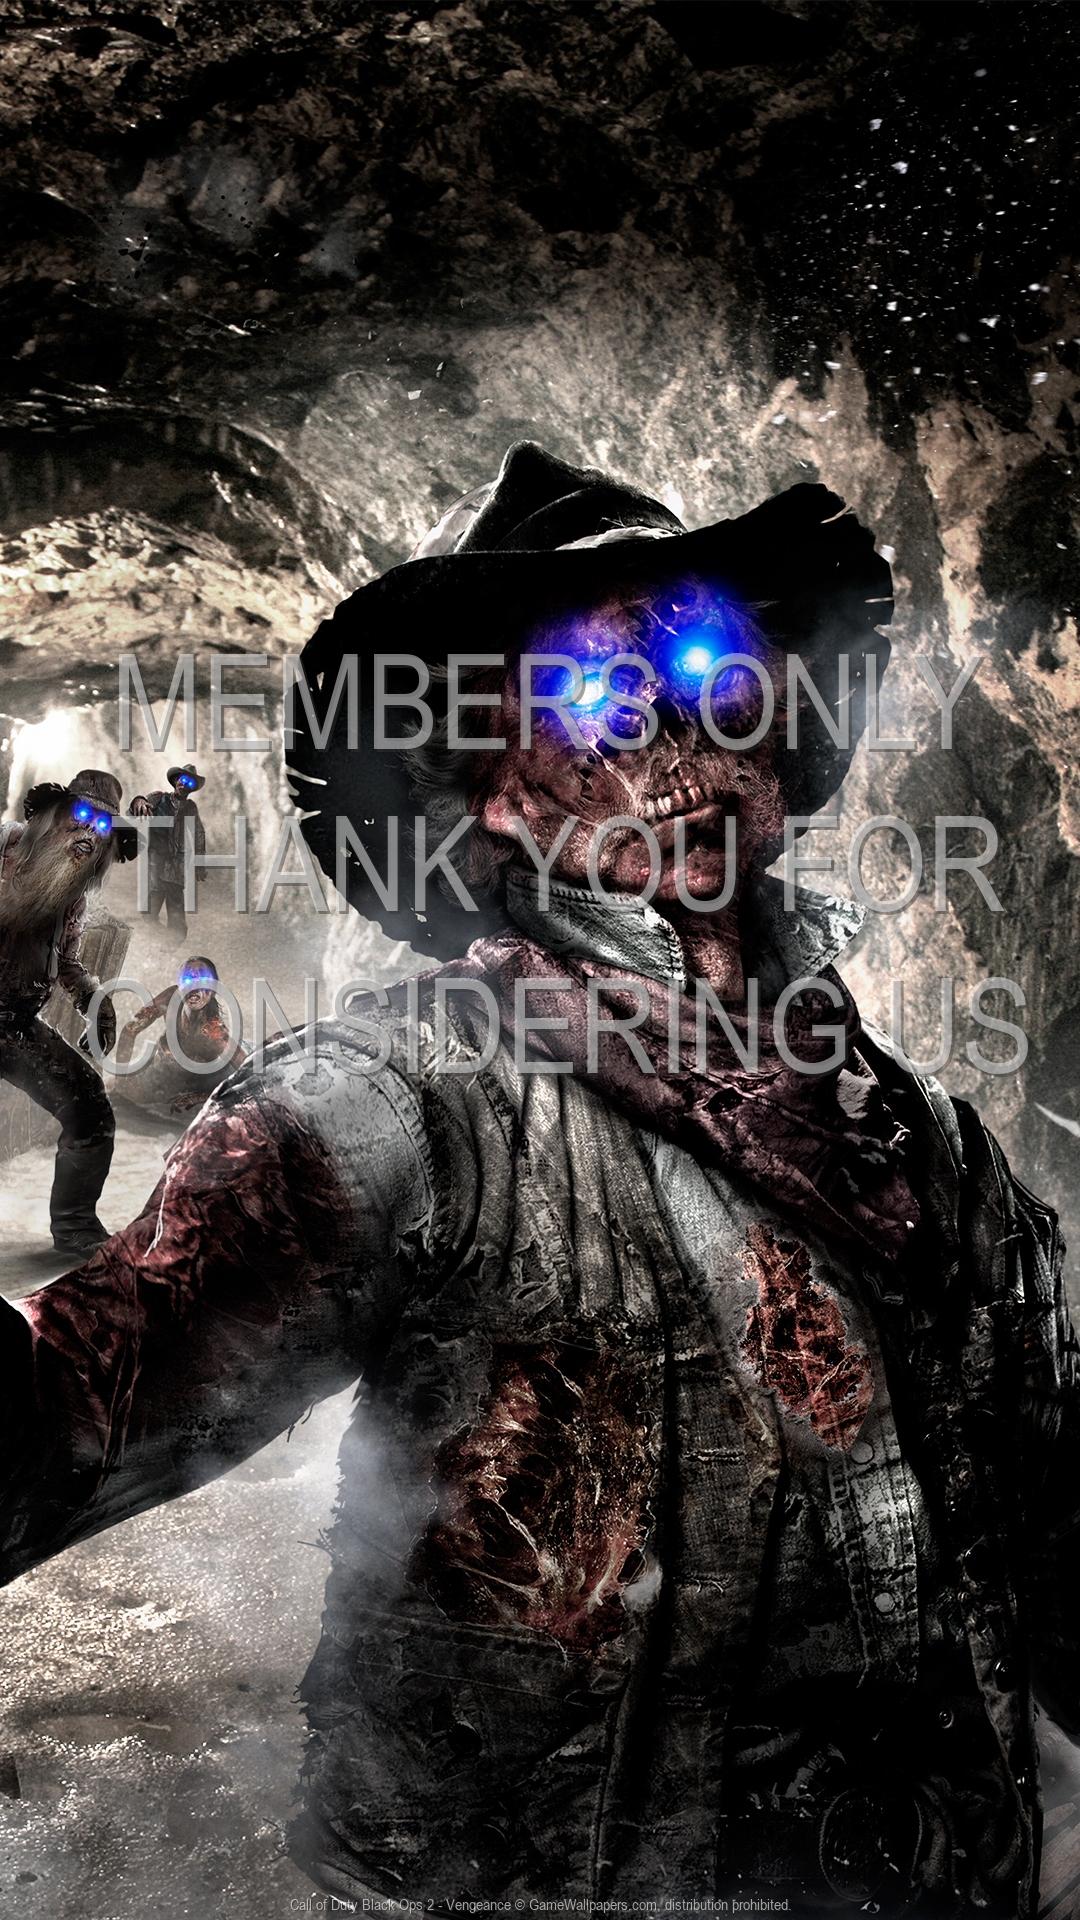 Call Of Duty Black Ops 2 Vengeance Wallpaper 02 1920x1080